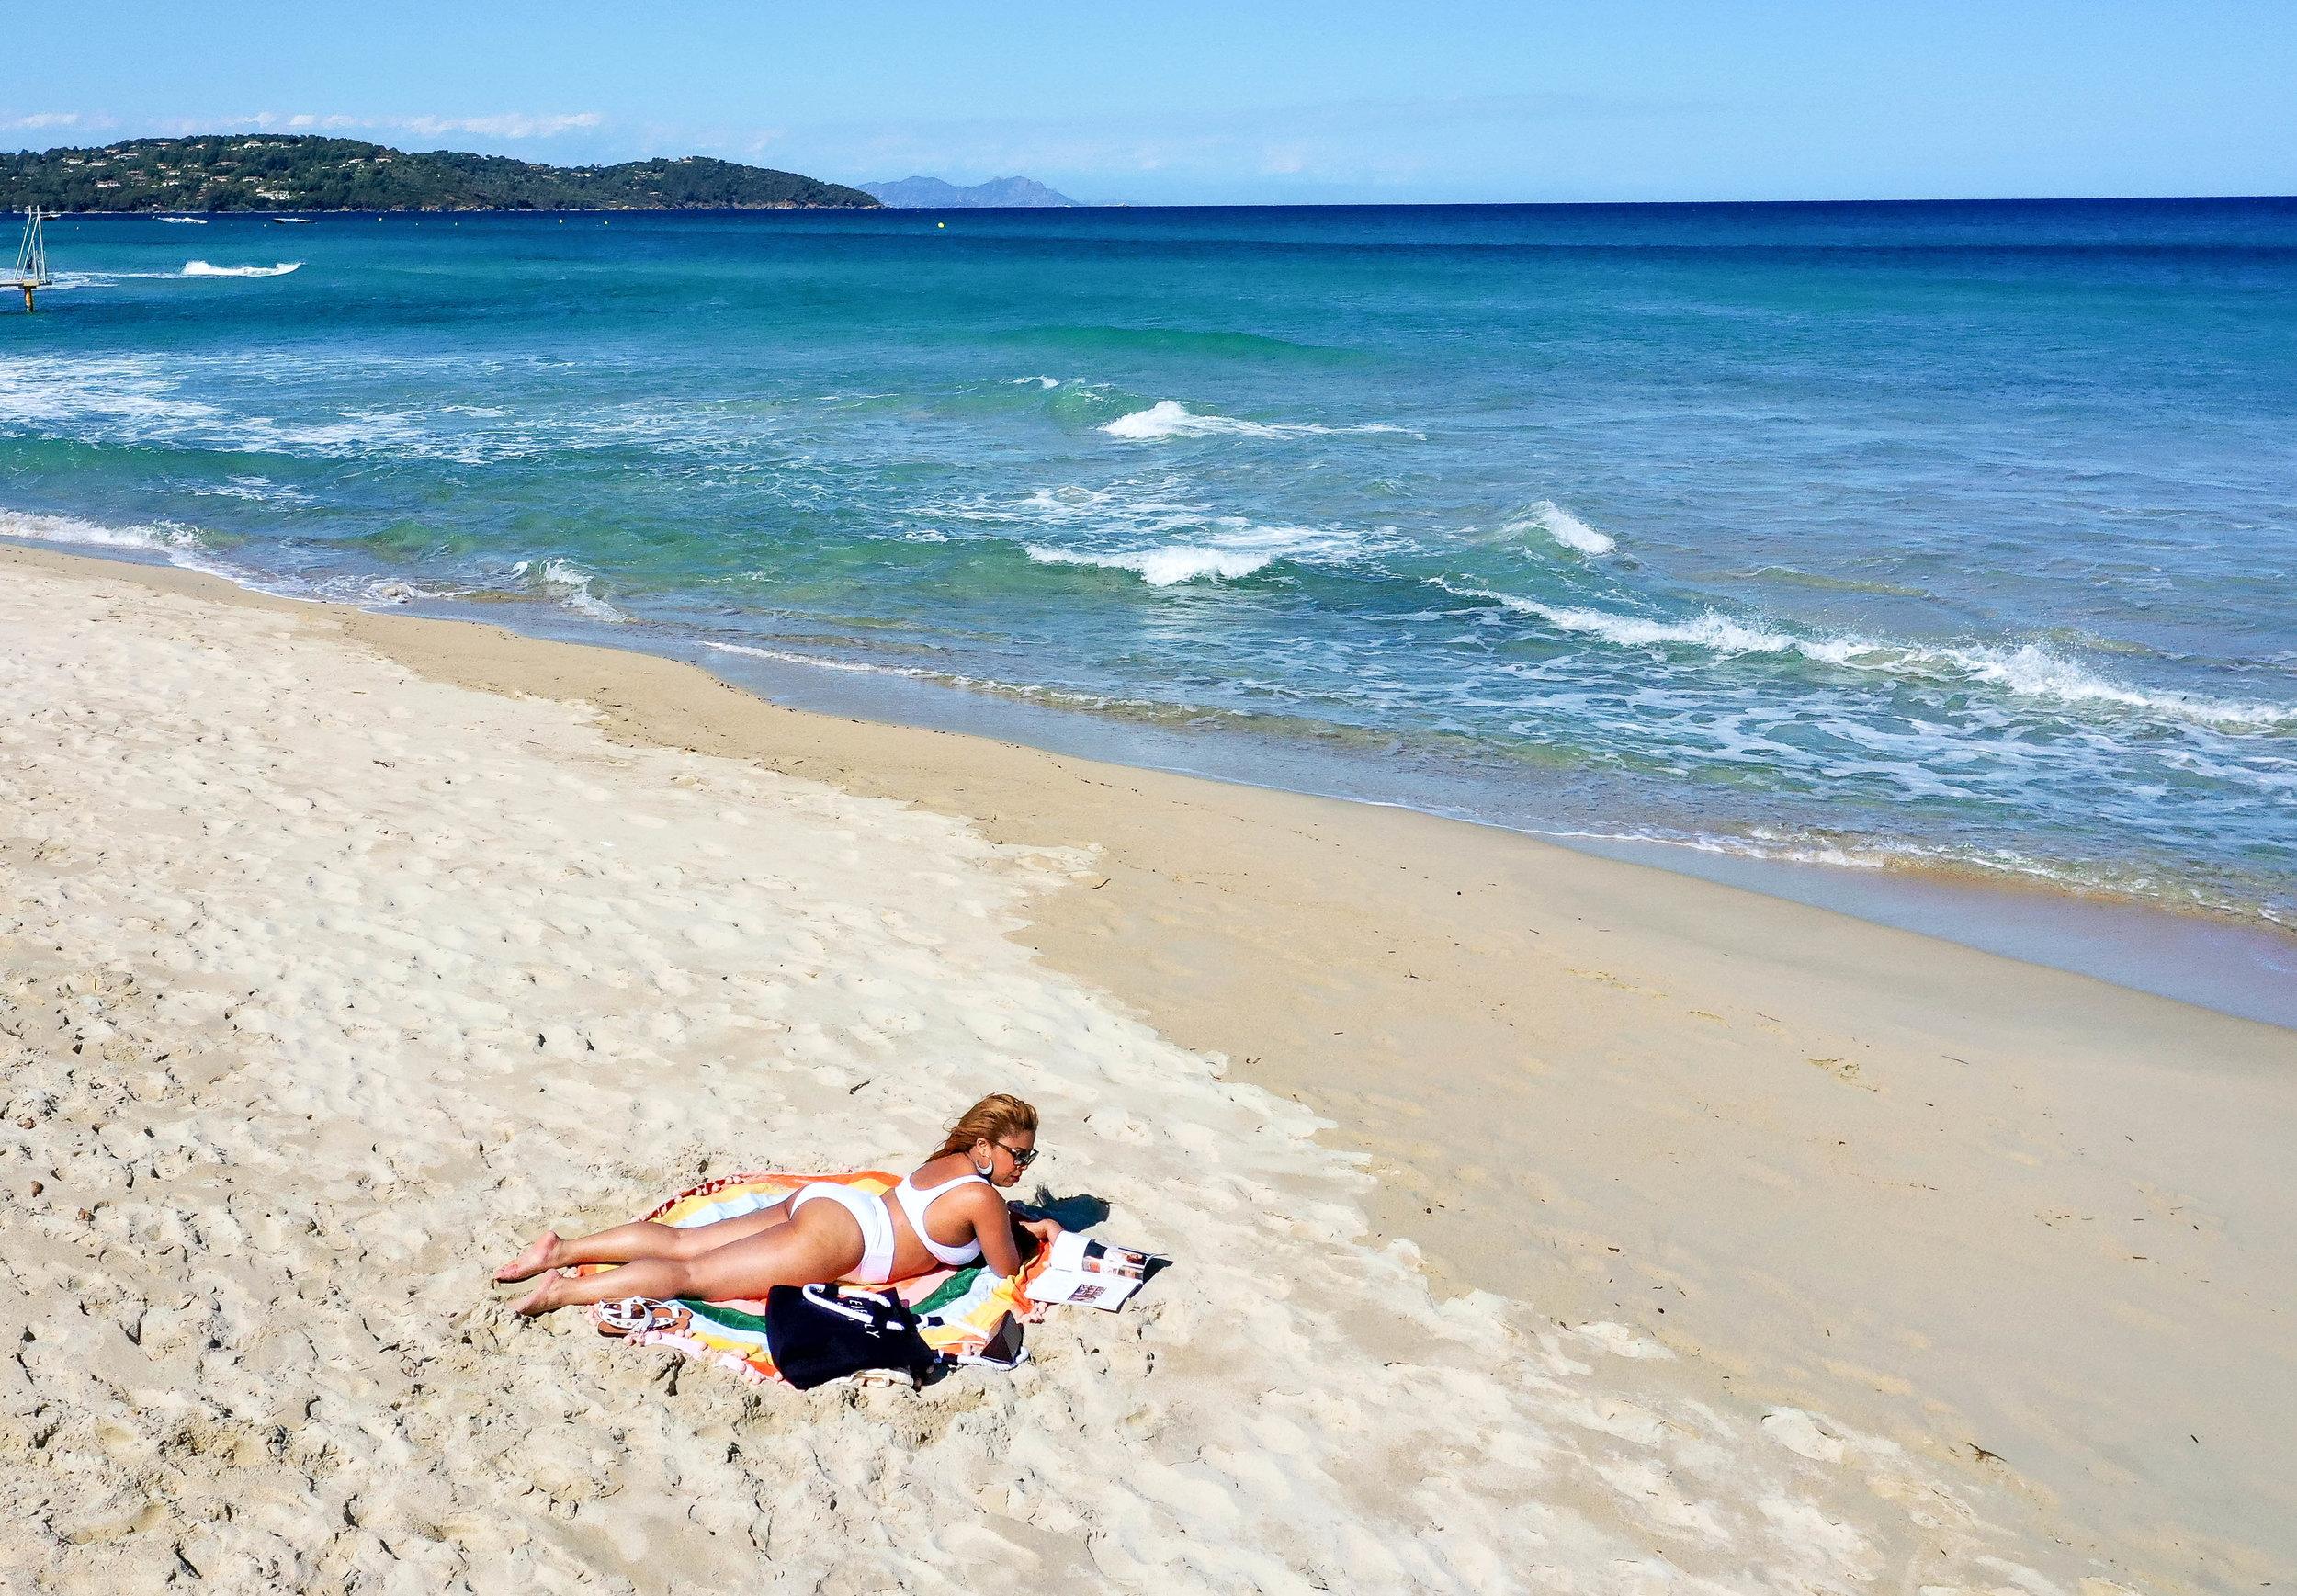 Pampelonne Beach in Saint-Tropez, France